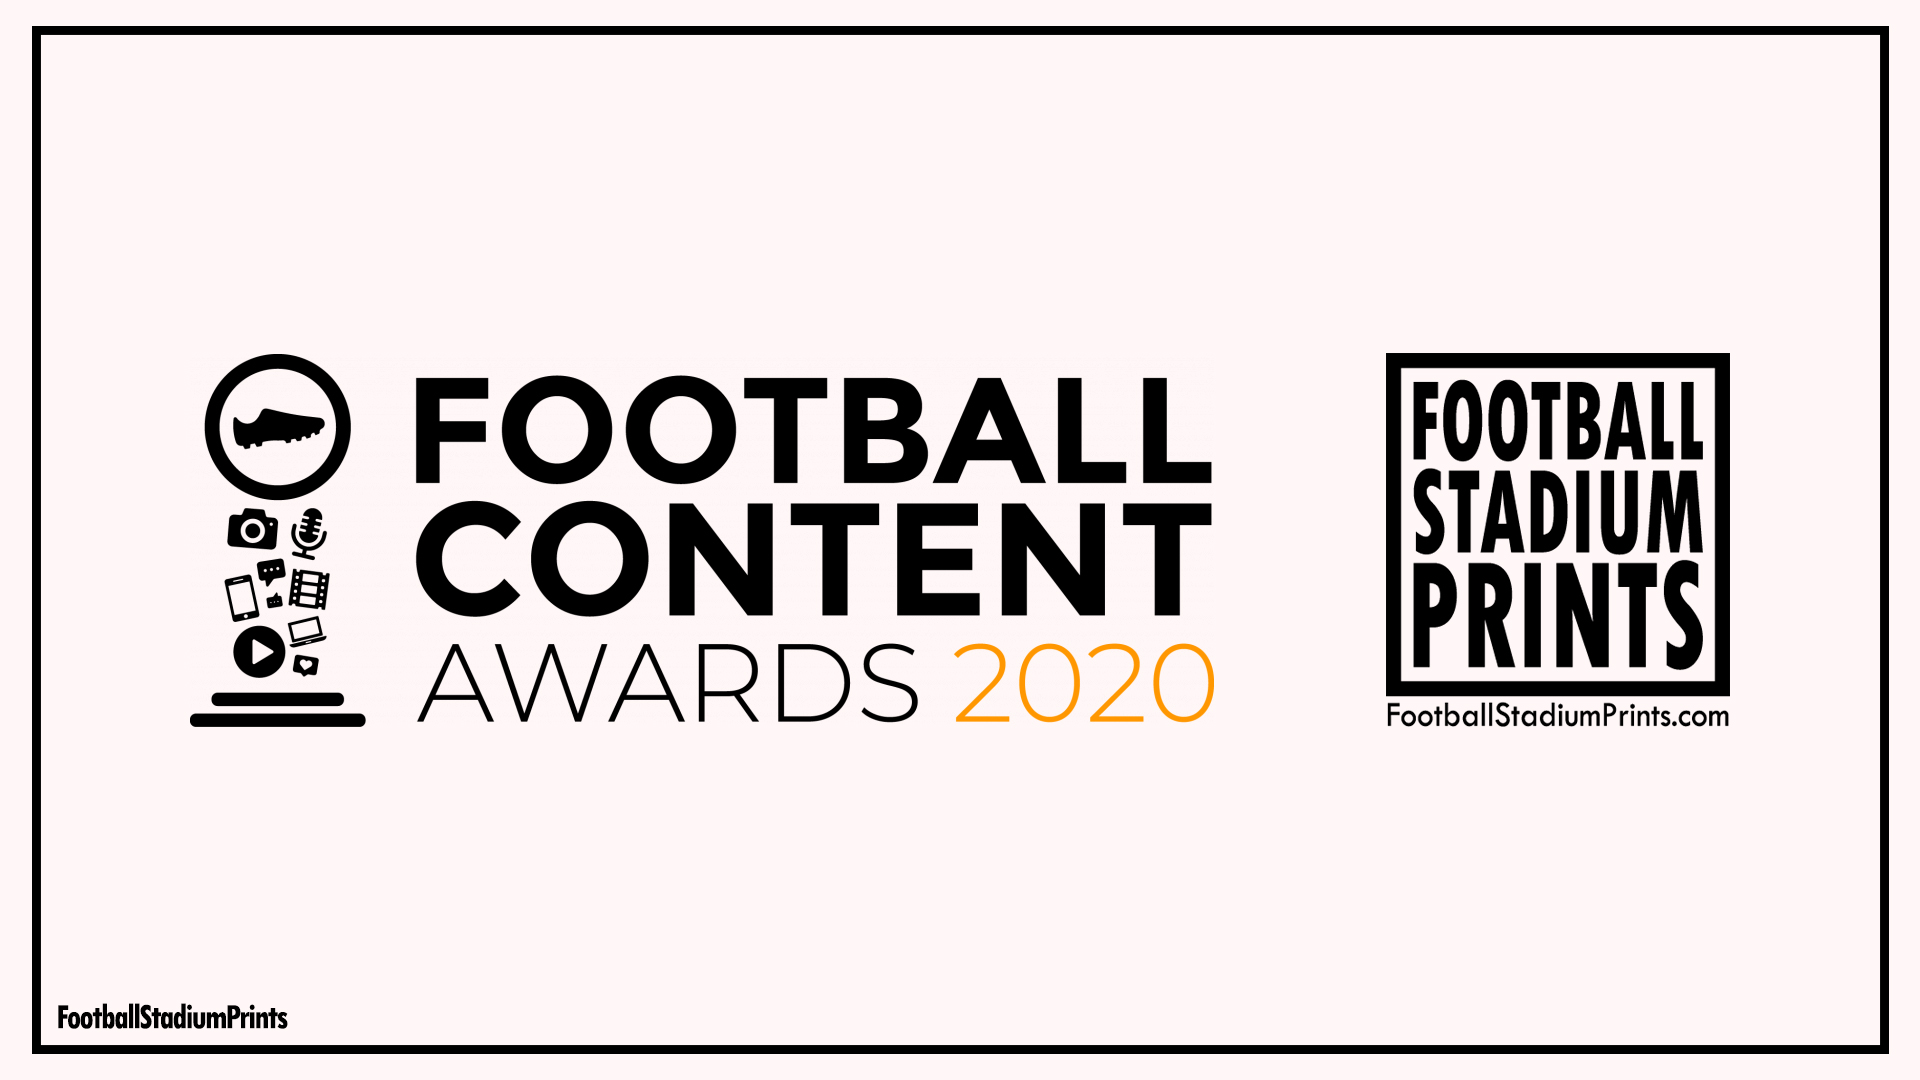 Football Content Awards 2020